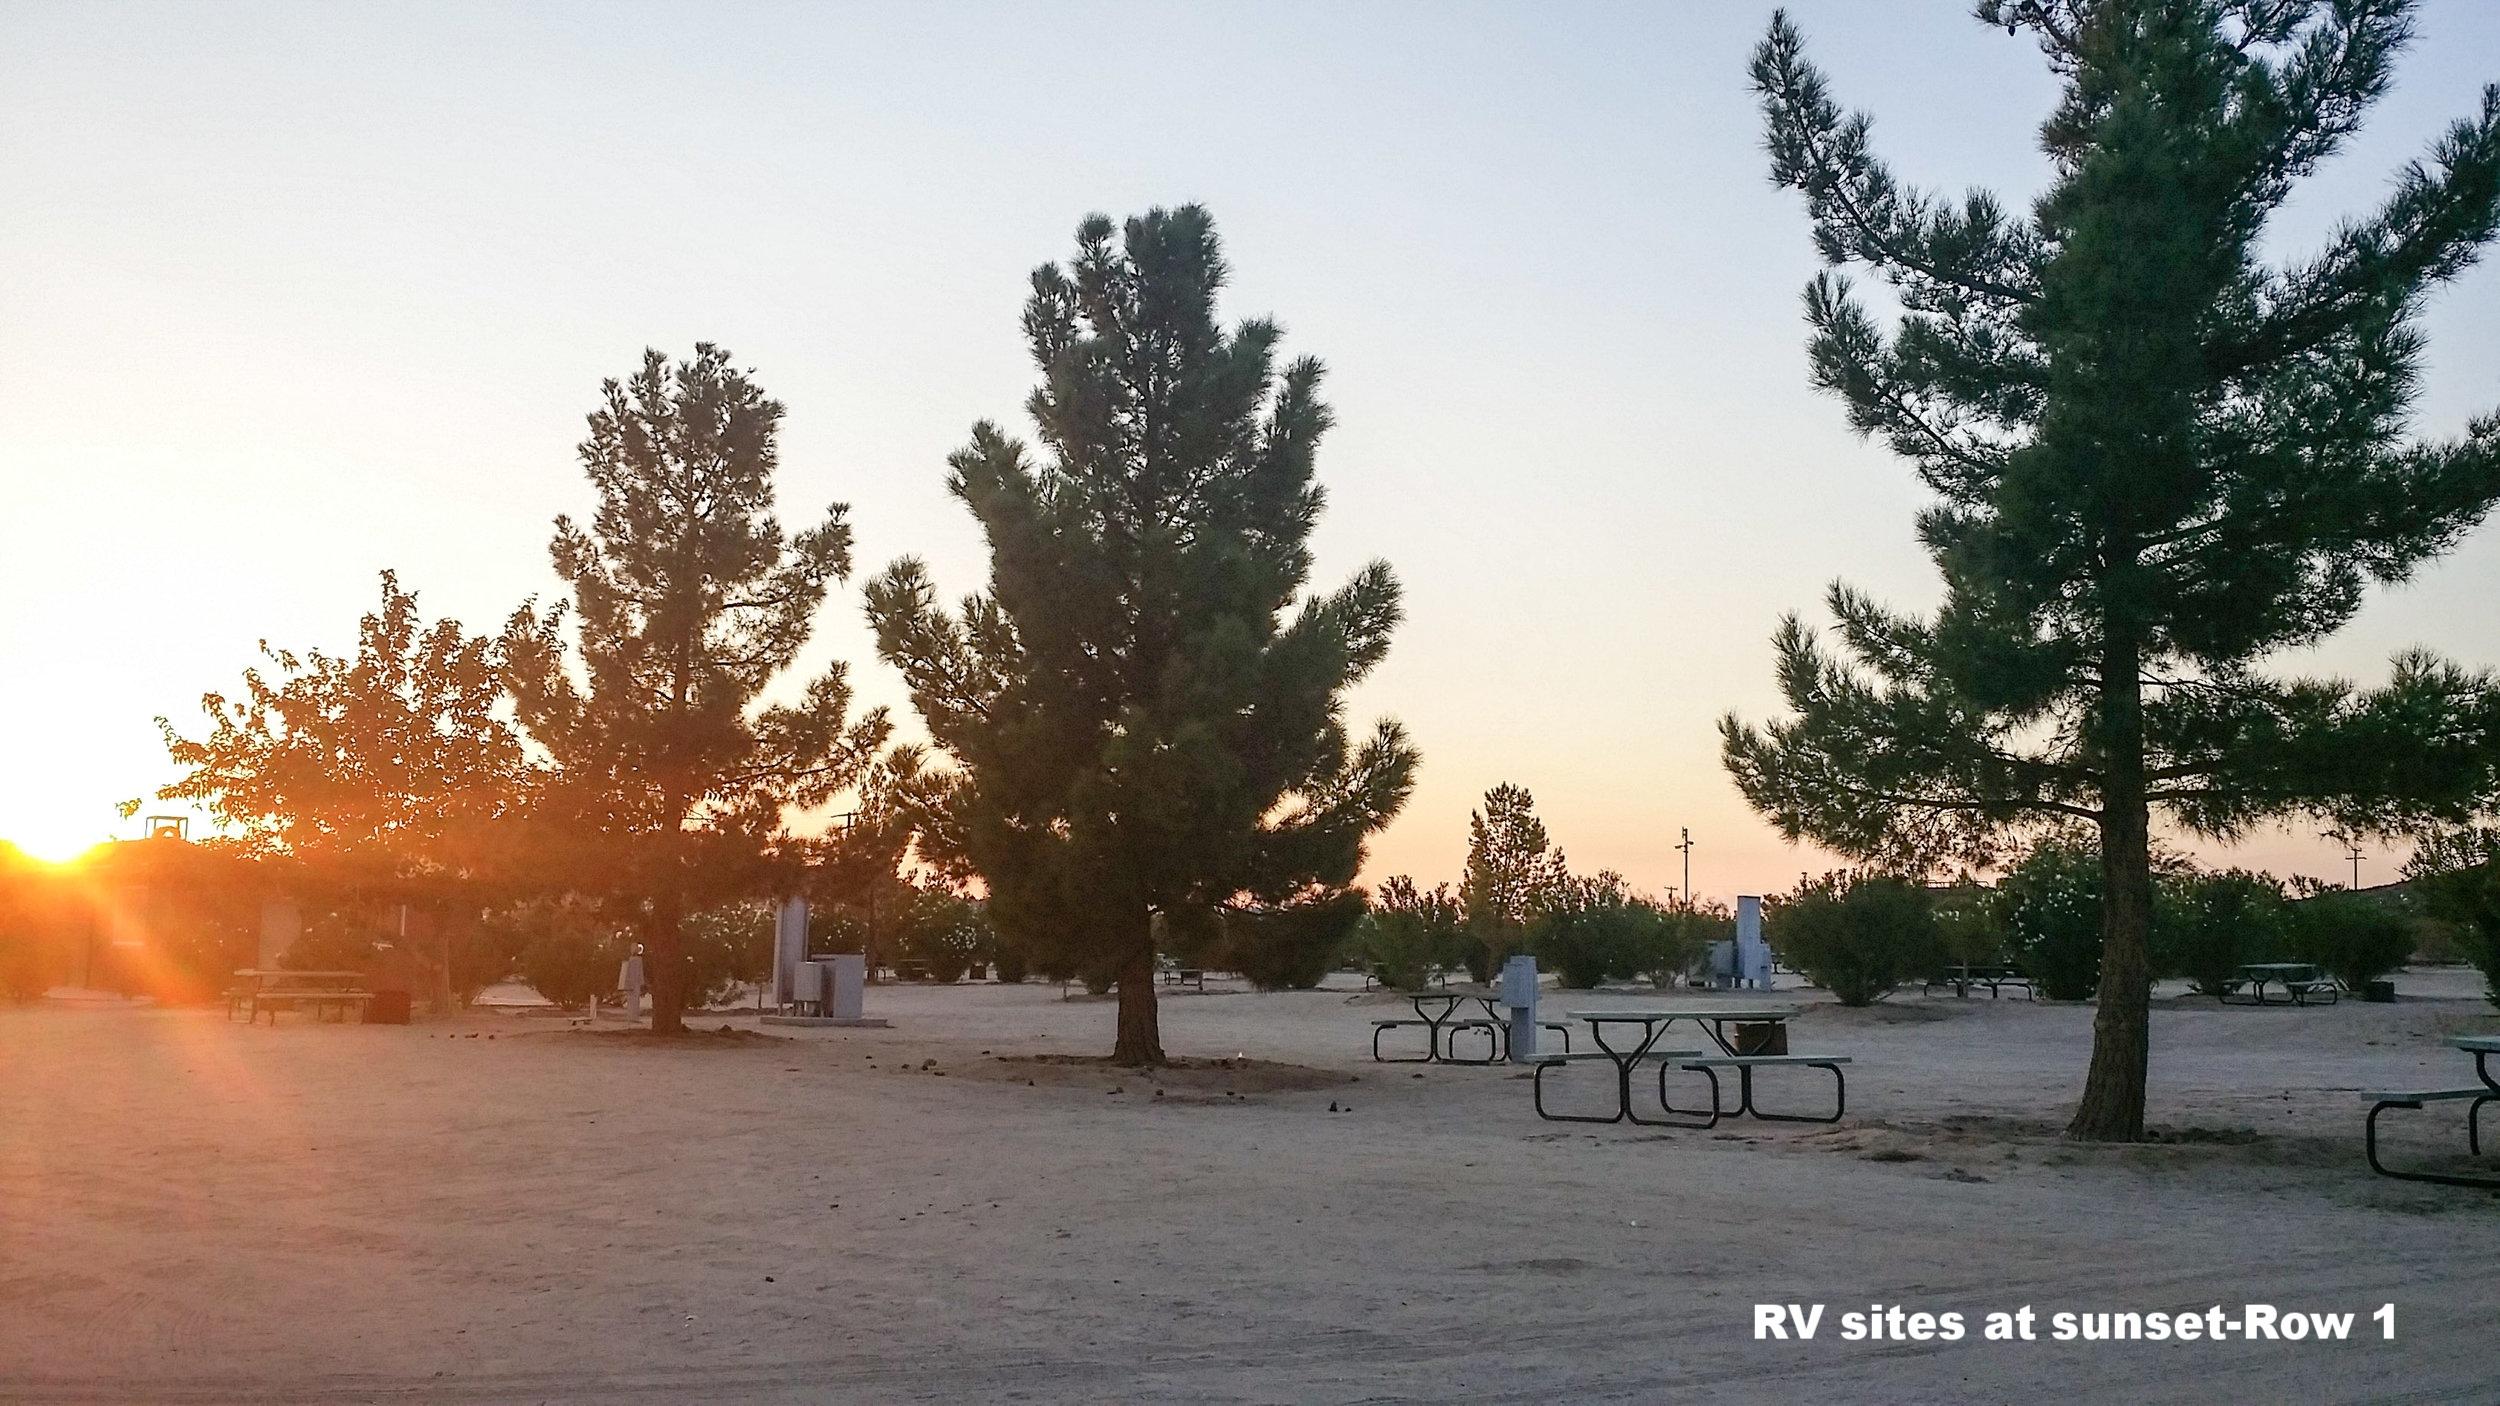 RV sites at sunset-Row 1.jpg